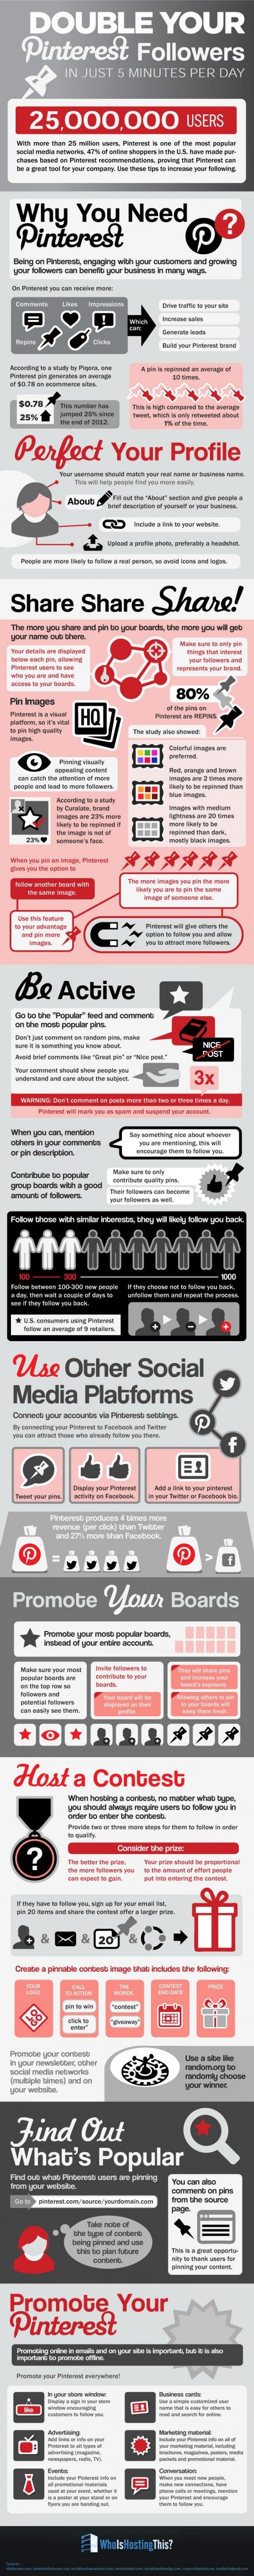 infografia ganar seguidores pinterest